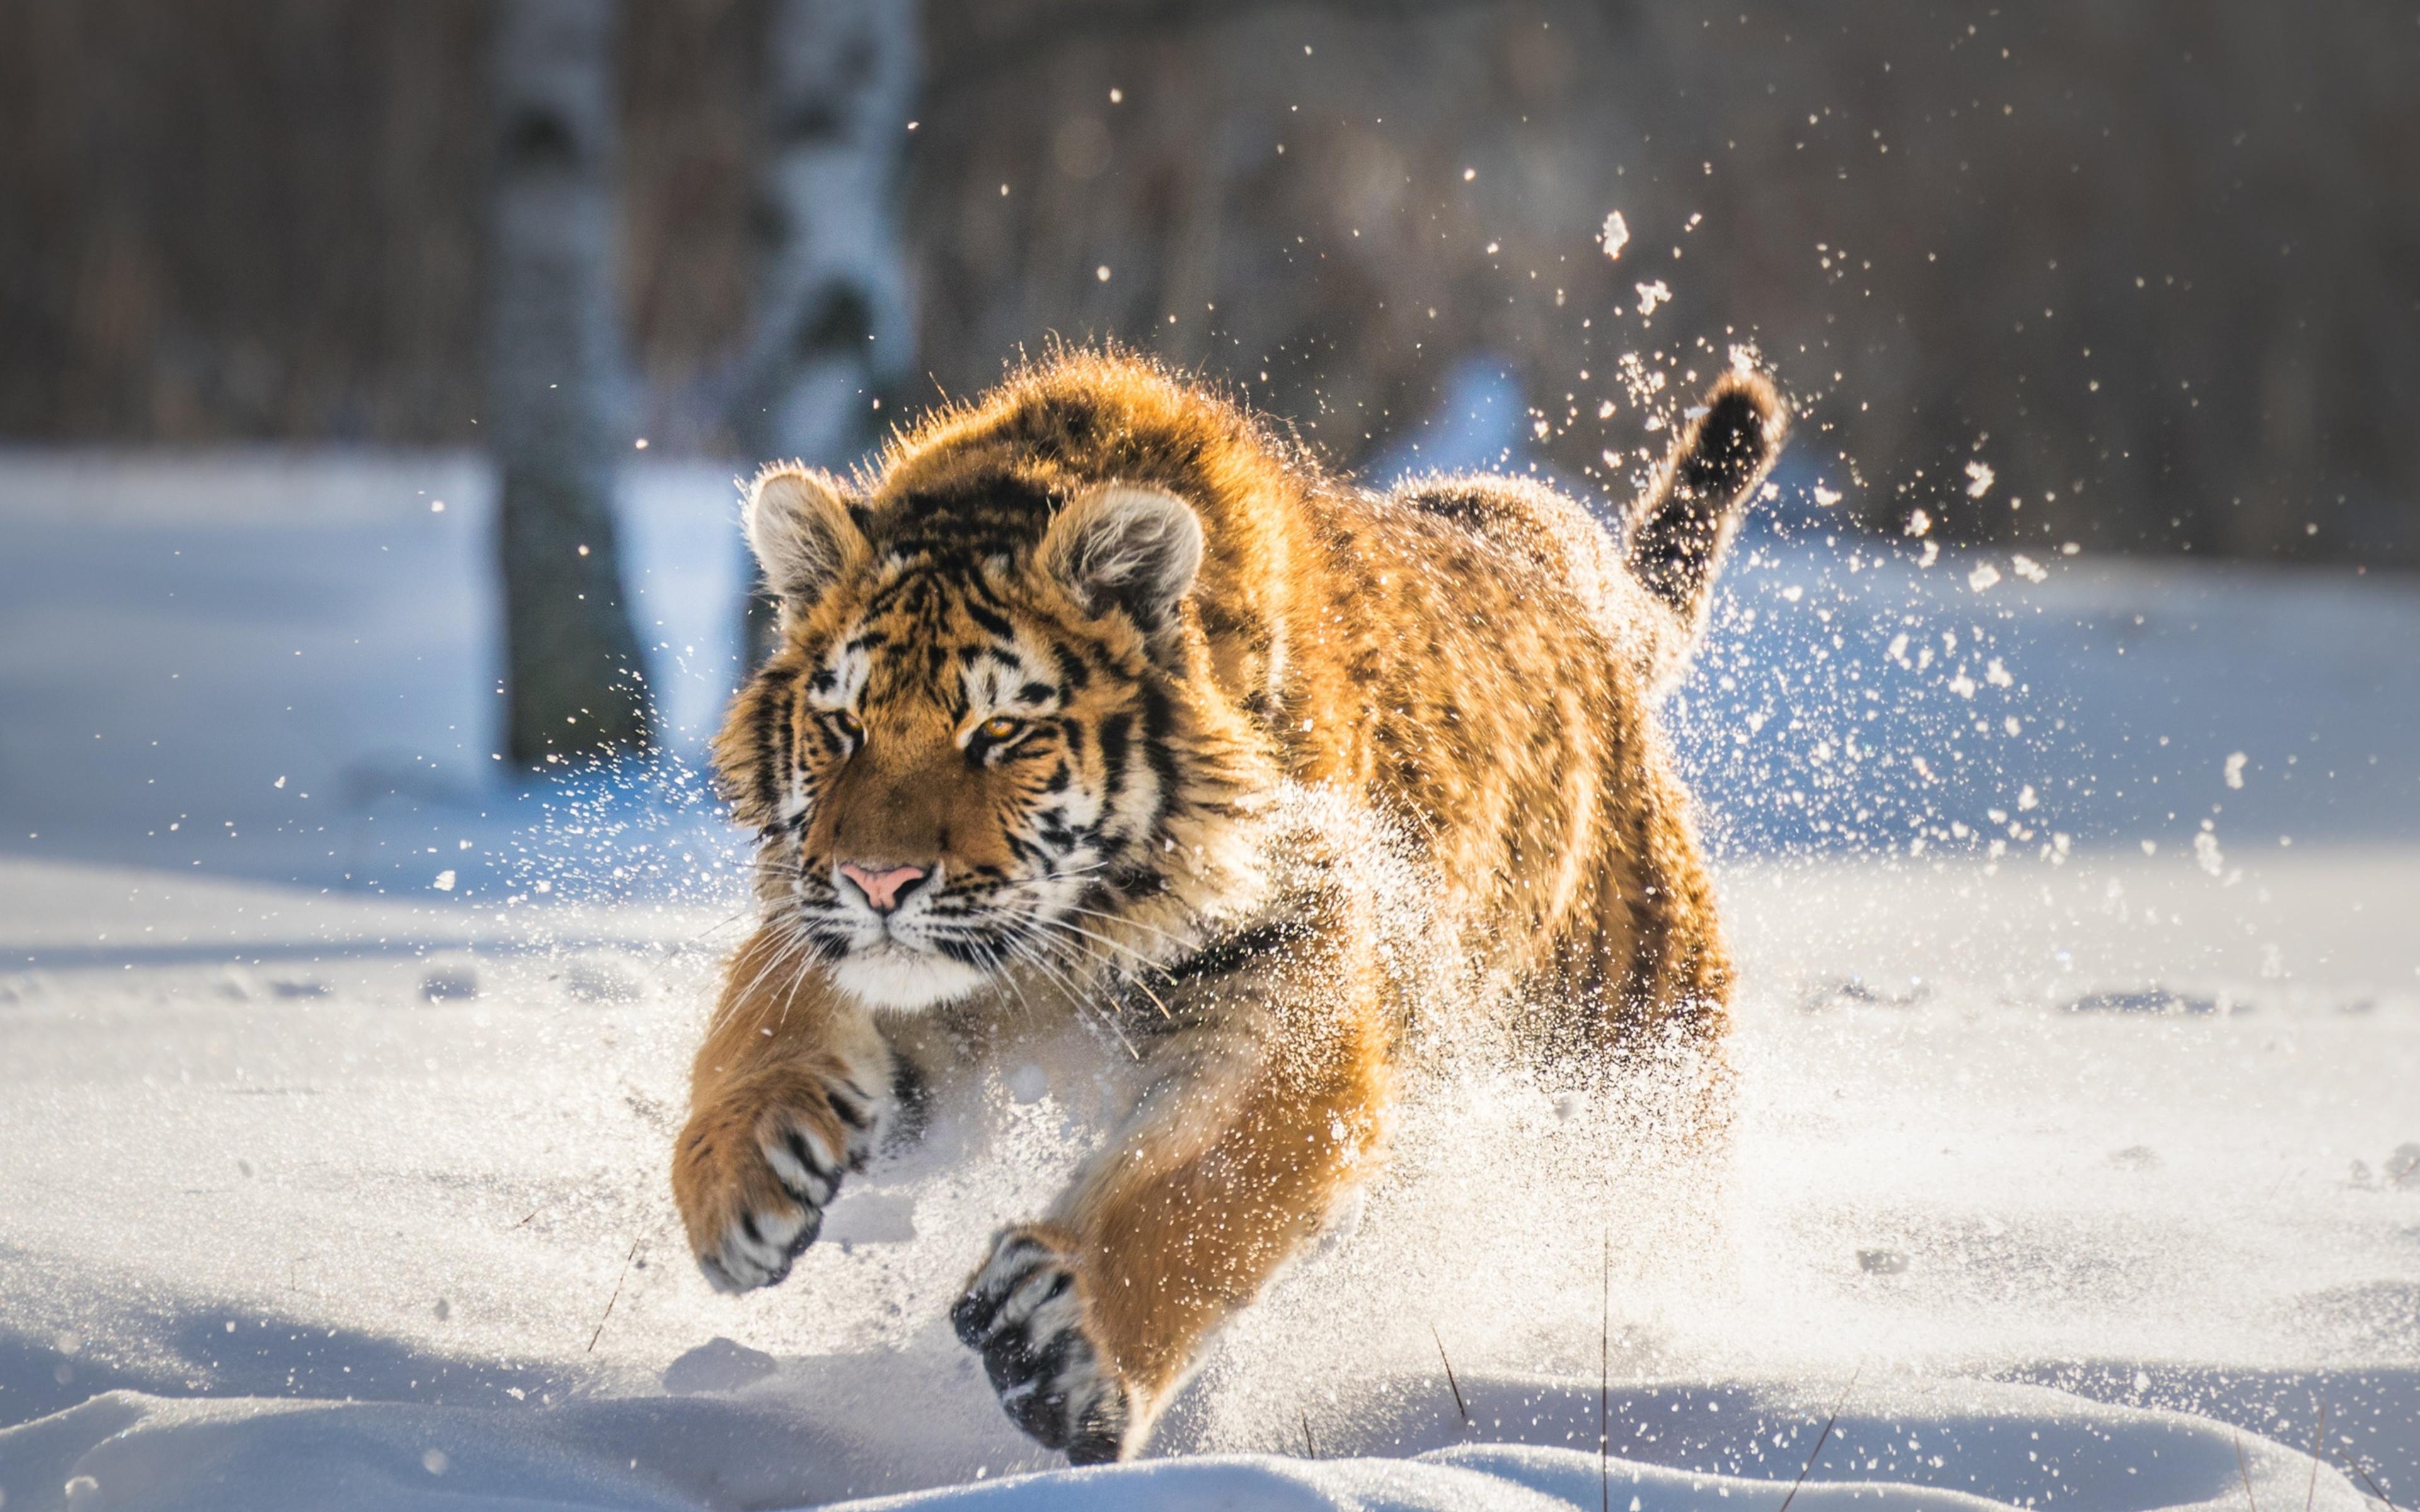 cute-tiger-cub-running-oq.jpg